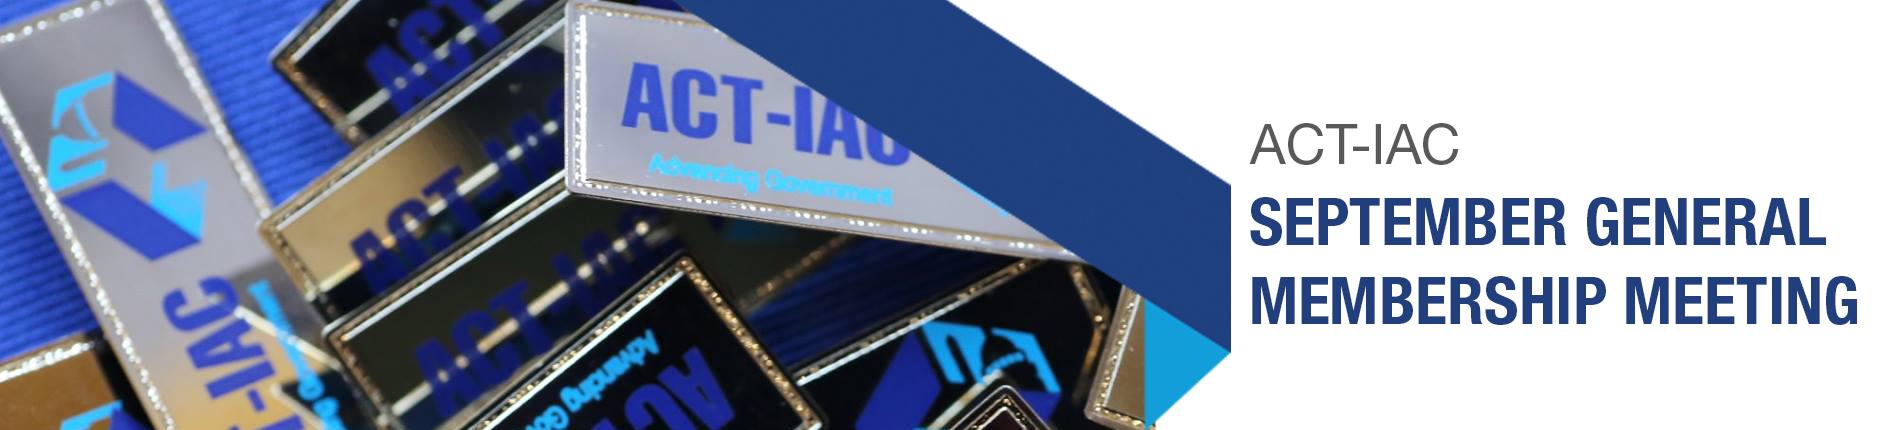 ACT-IAC September Membership Meeting